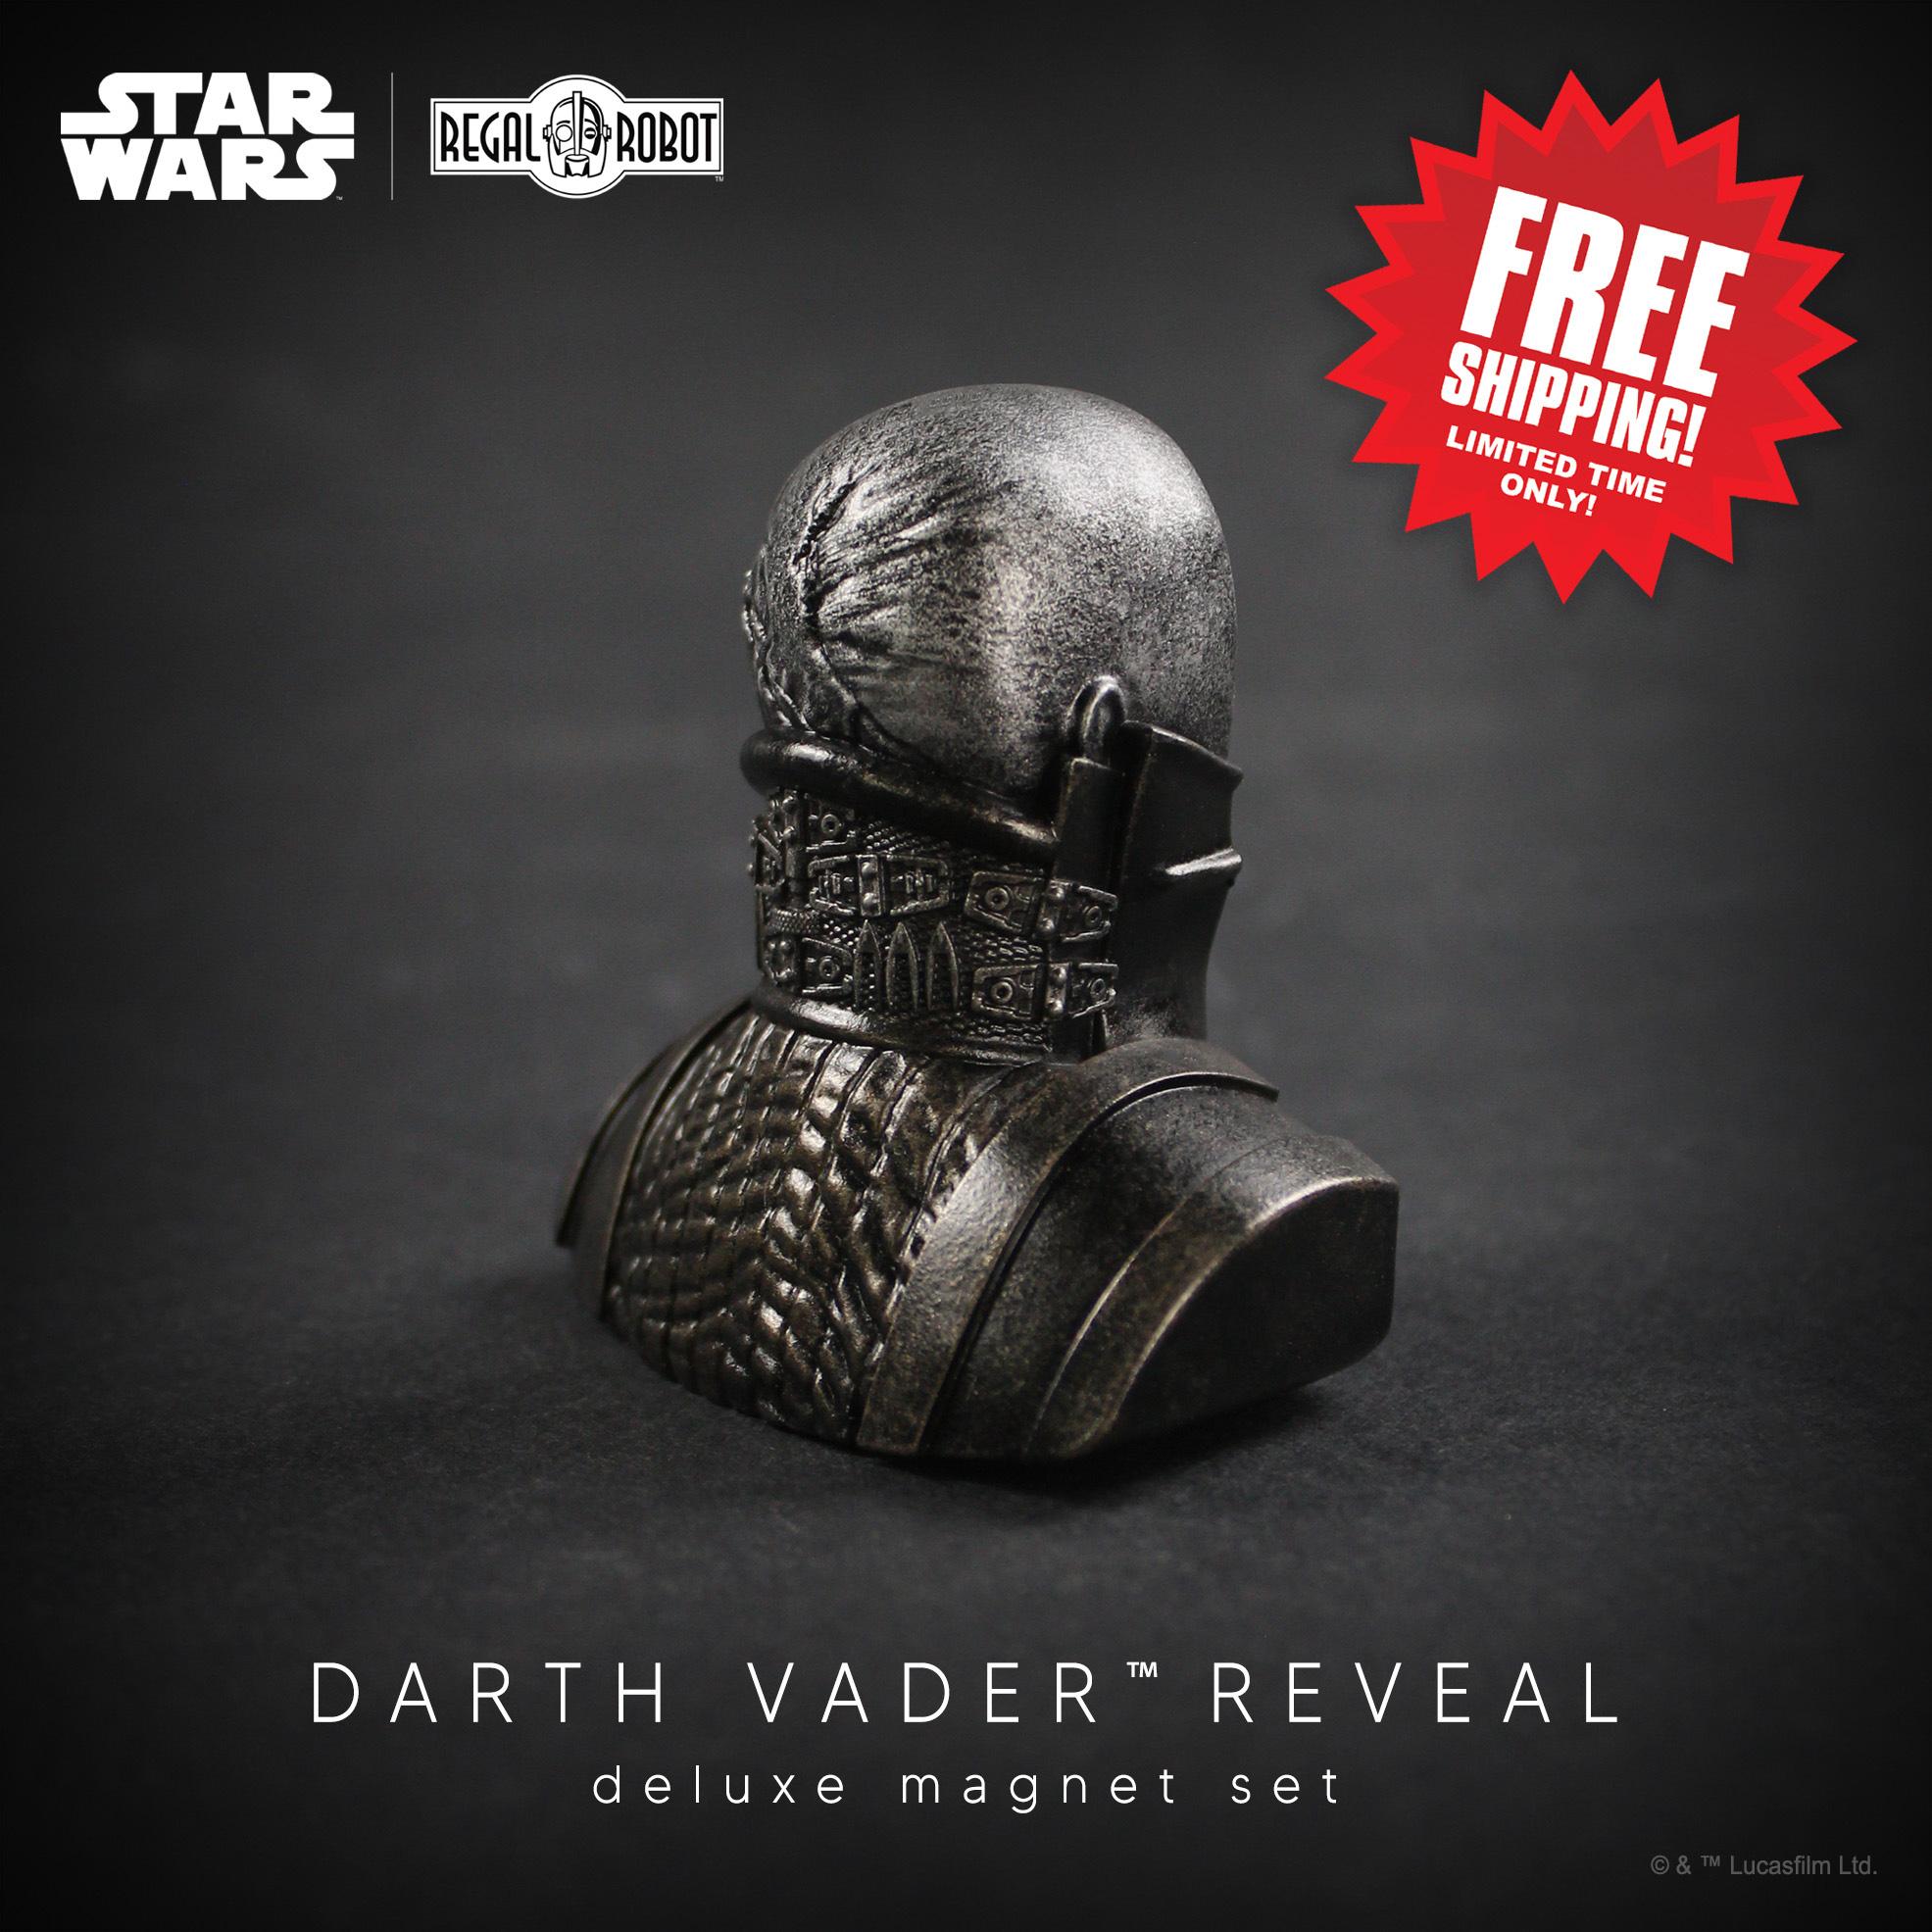 Darth Vader meditation chamber reveal sculpture magnet